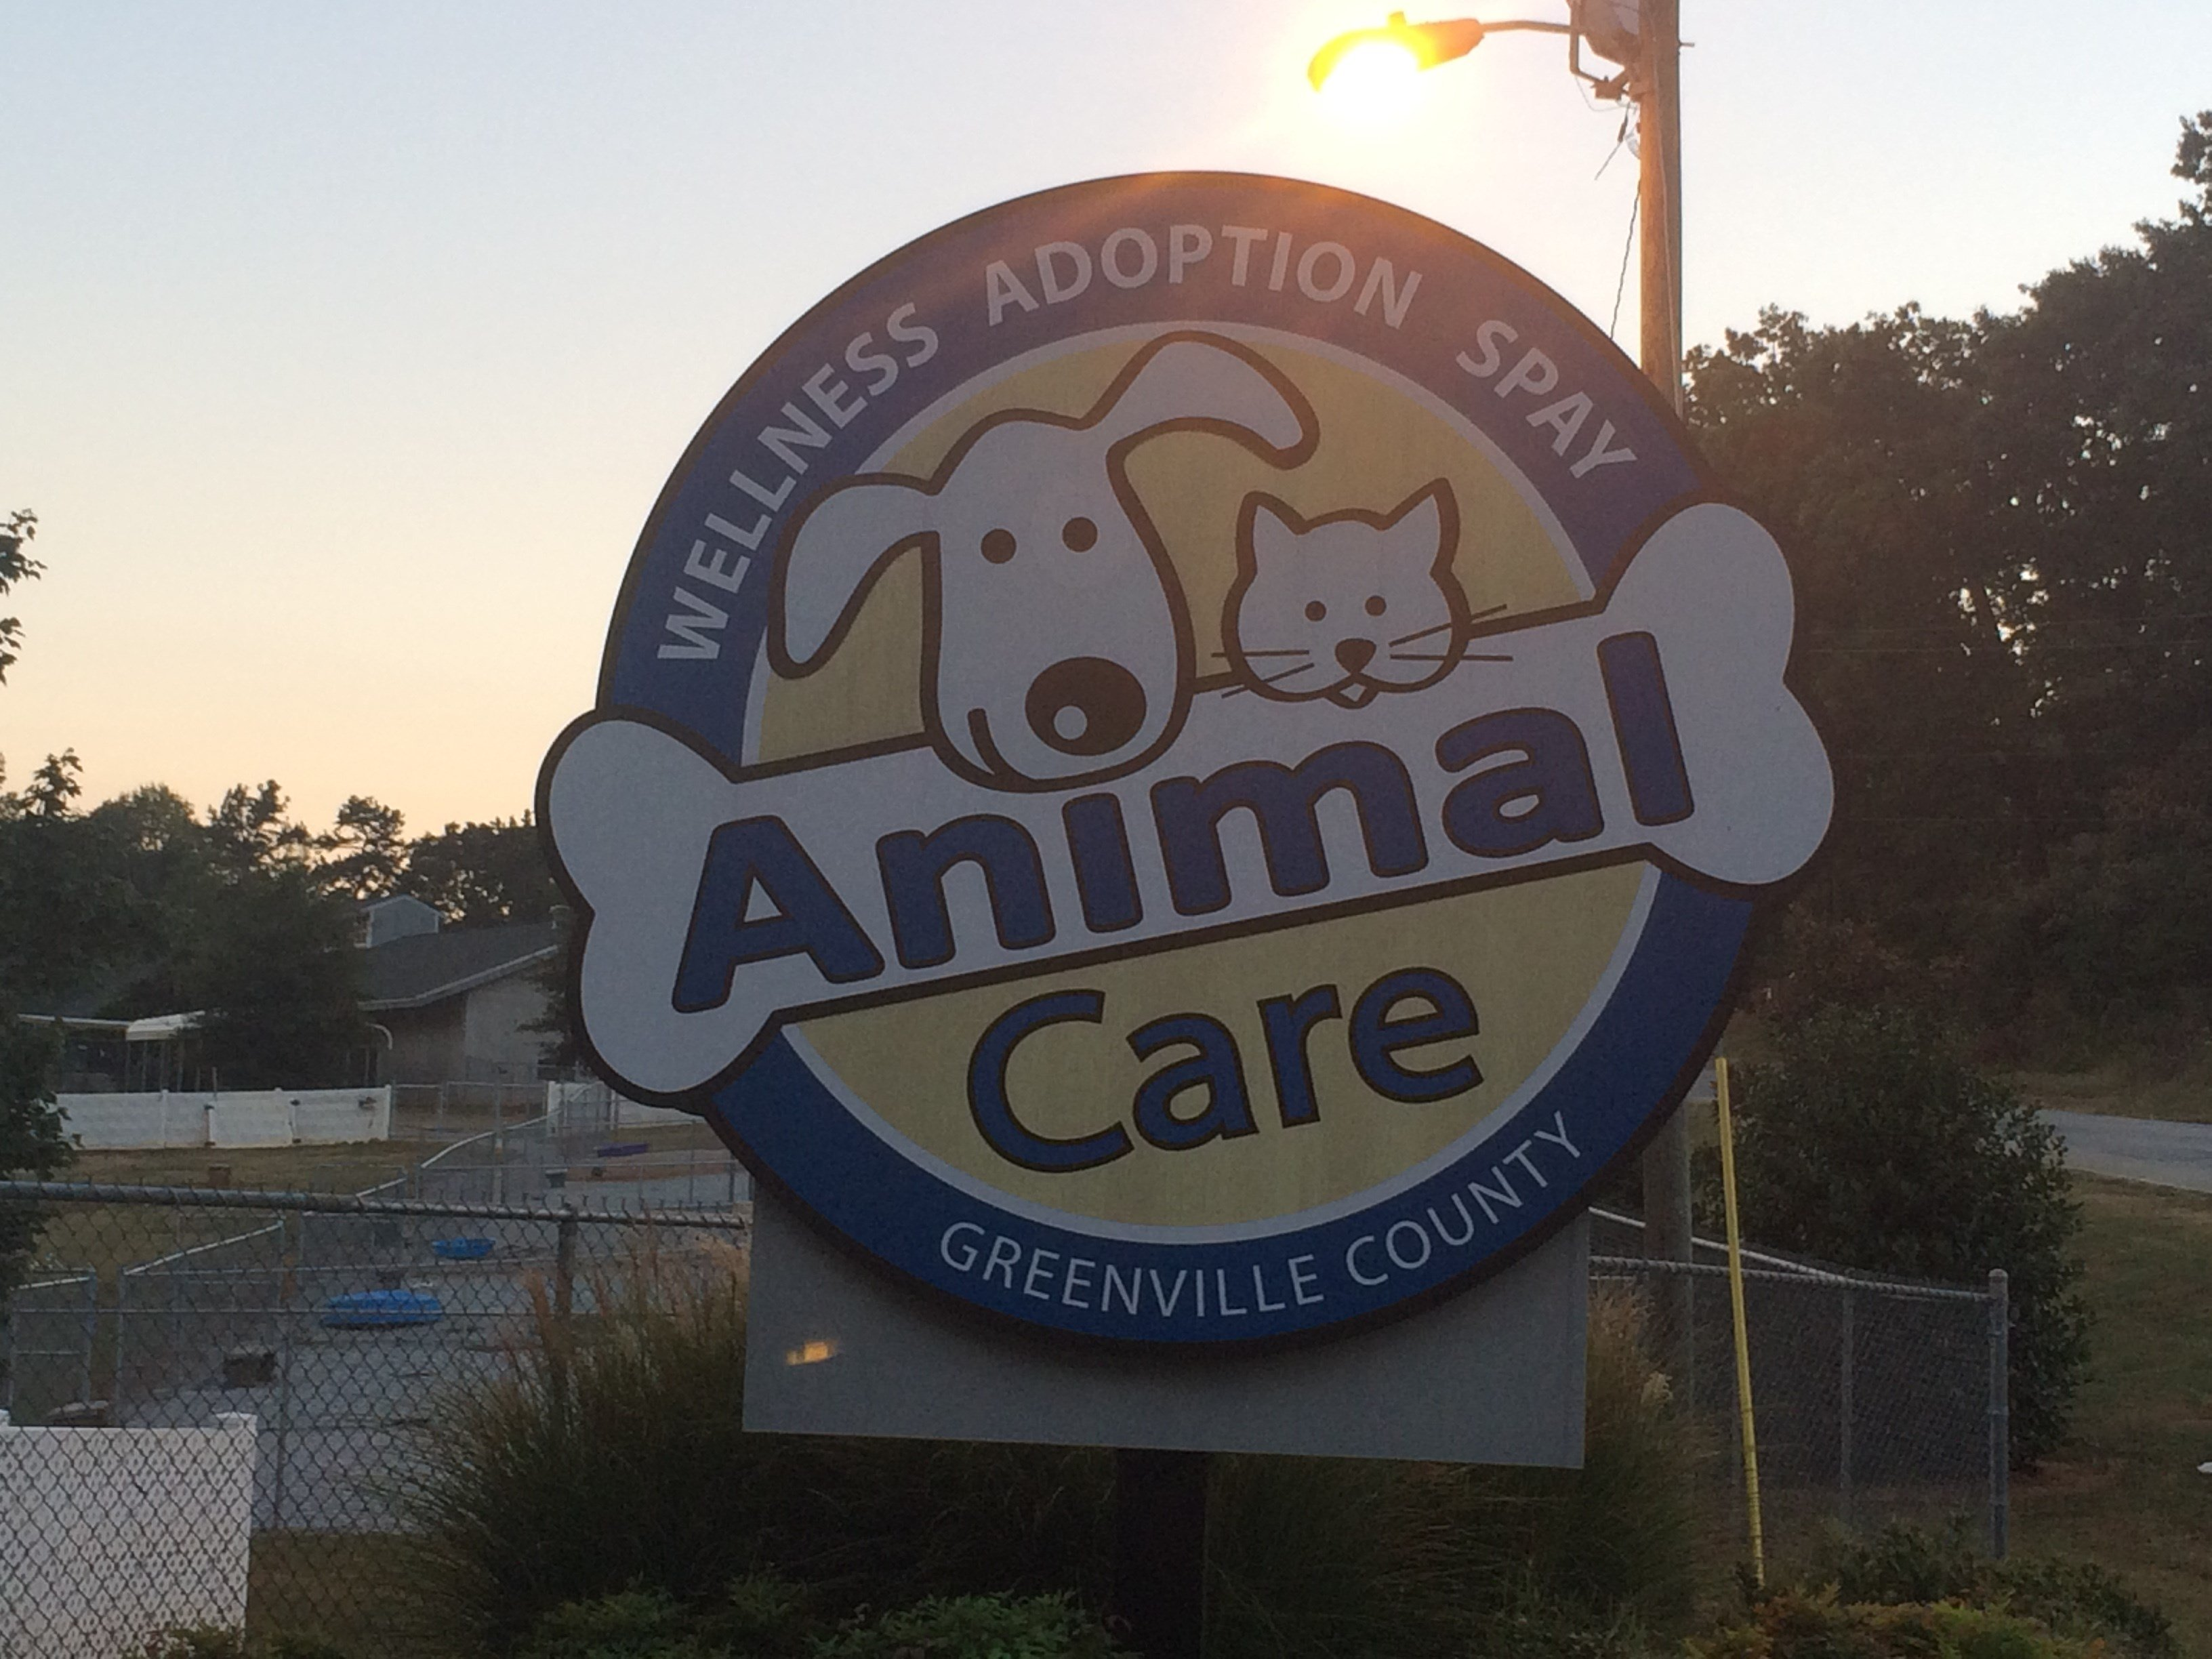 Greenville County Animal Care (Oct. 4, 2016/FOX Carolina)